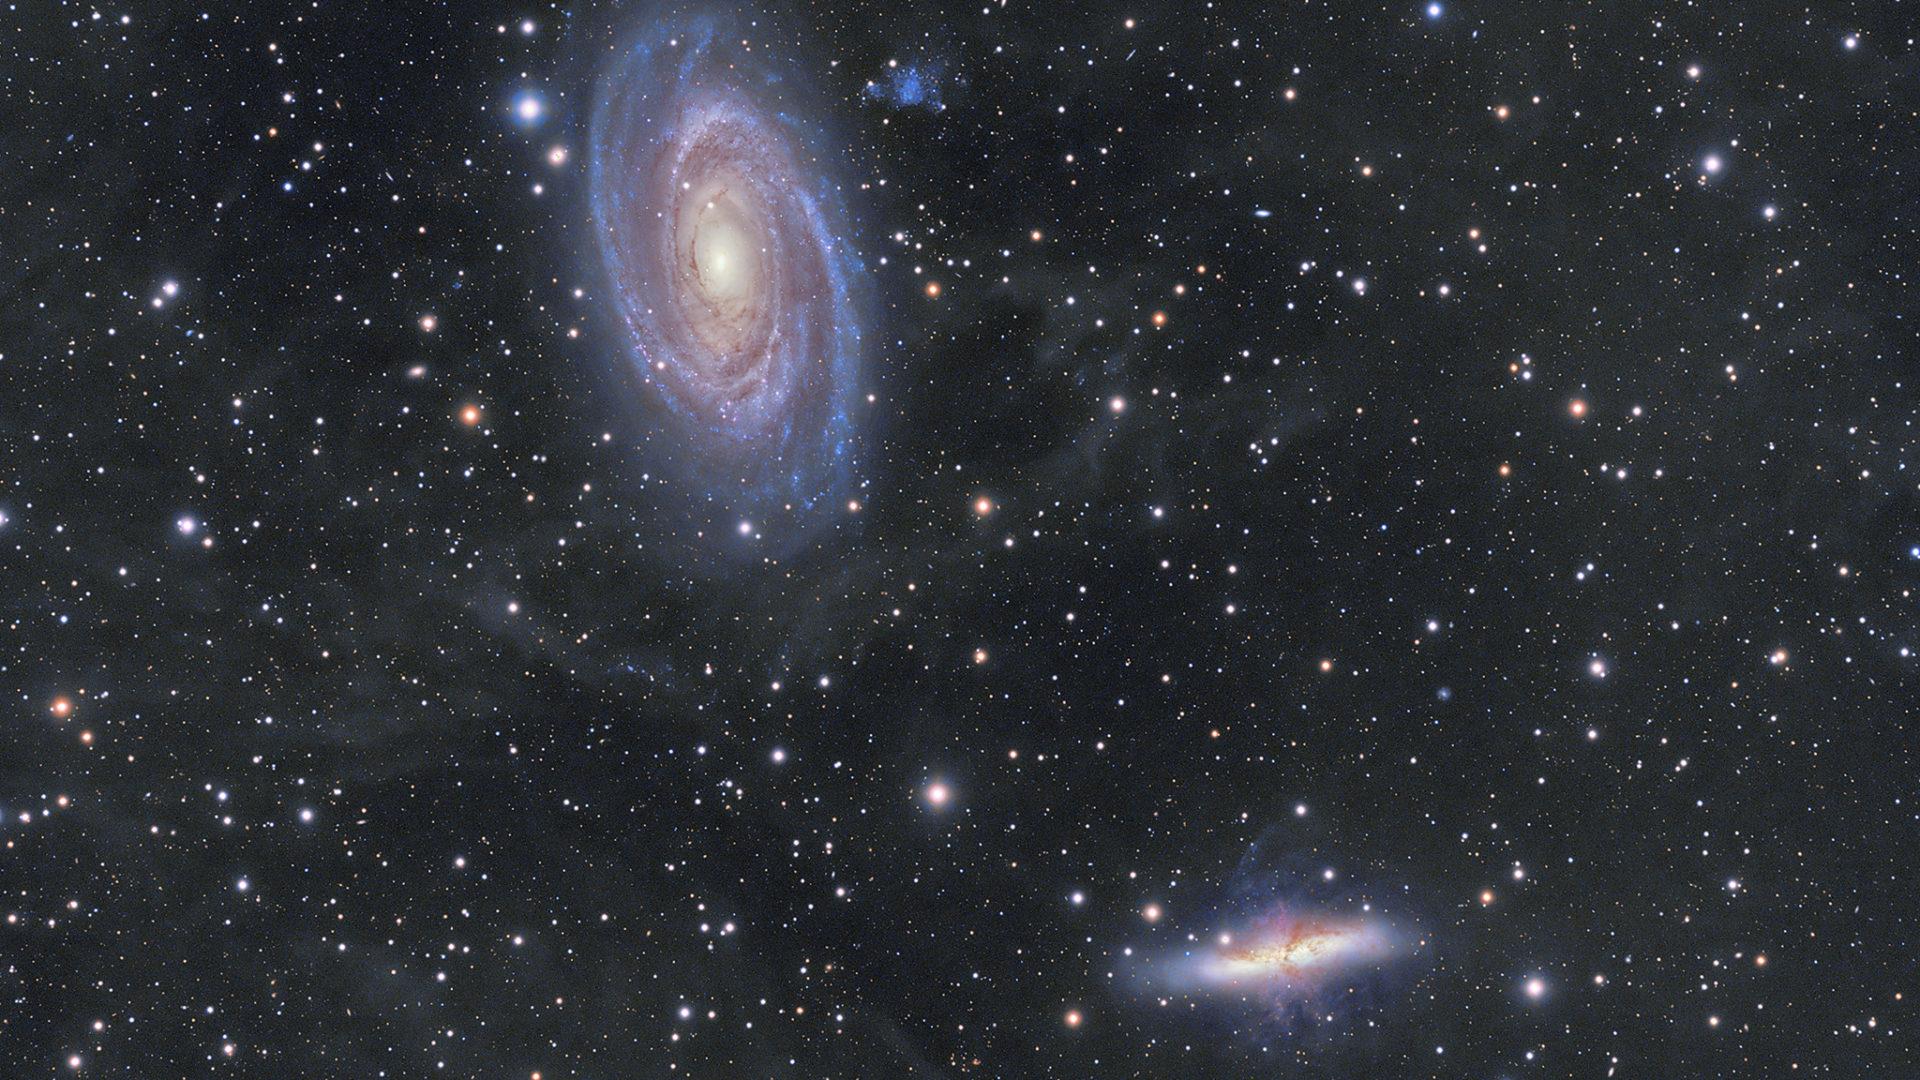 波德星系( Messier 81 )與雪茄星系( Messier 82 )